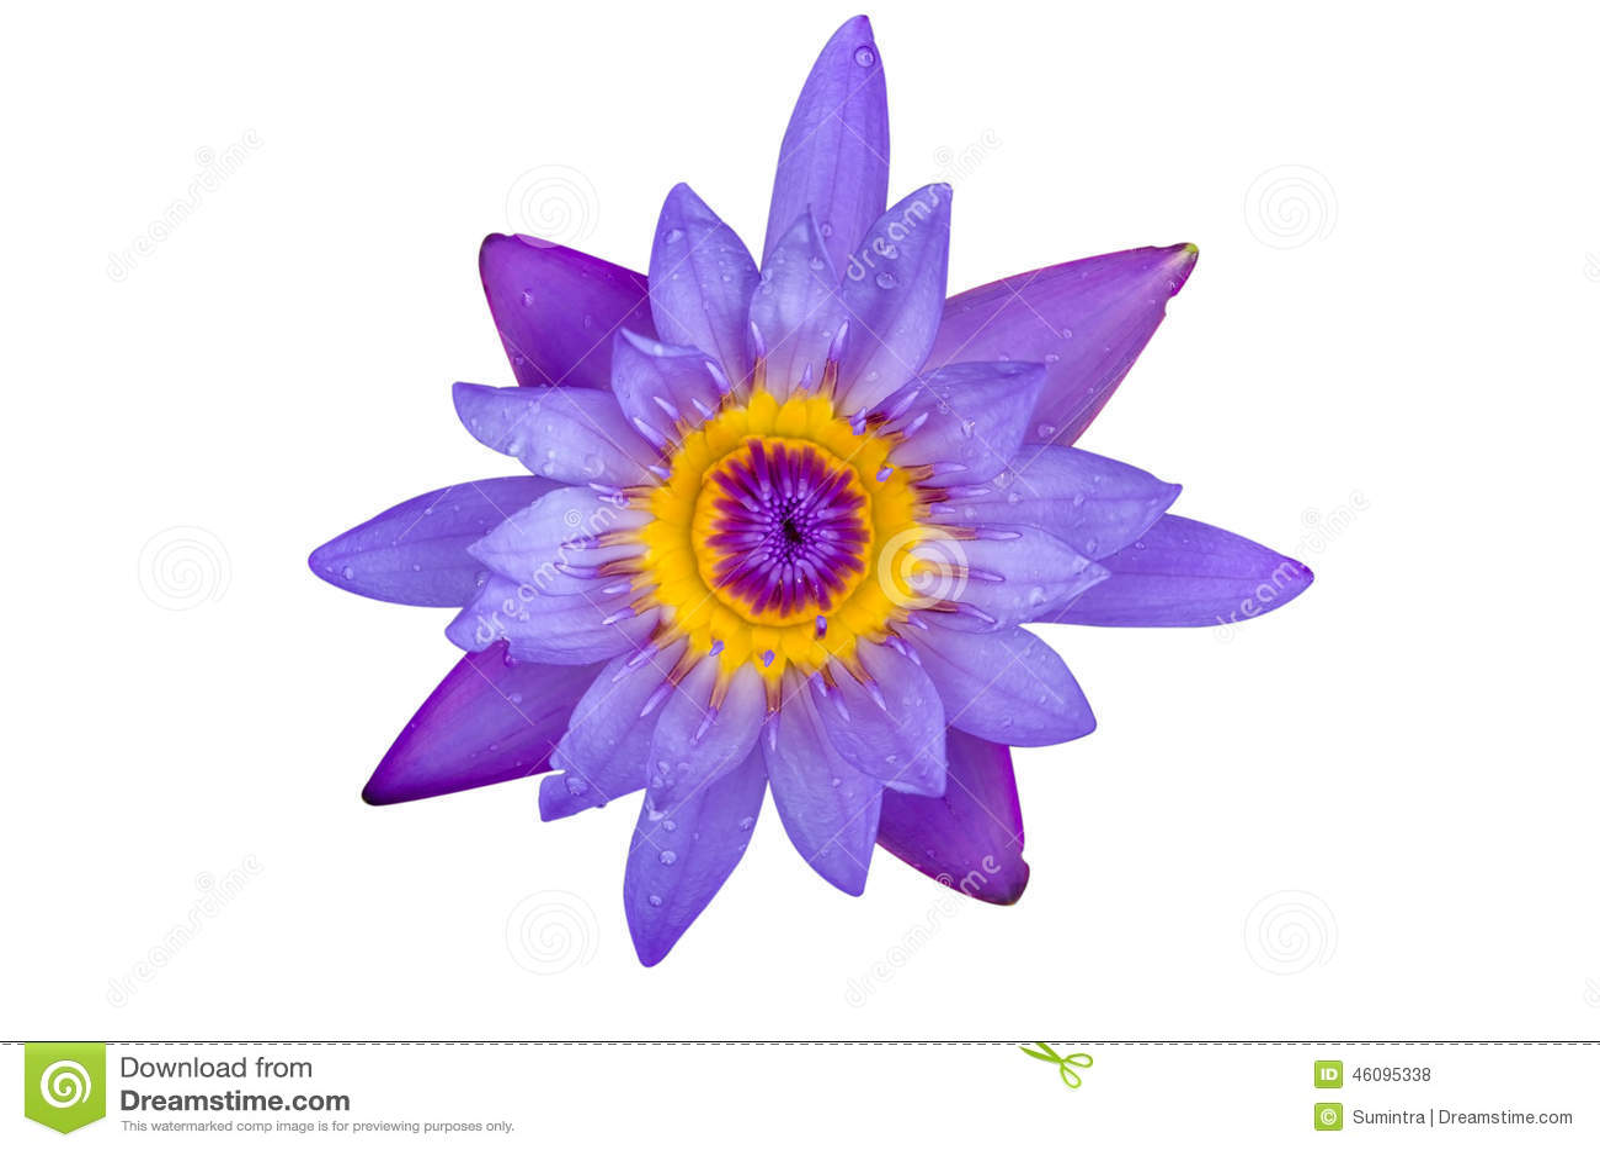 Blue lotus flower white background blue lotus flower and white background royaltyfree stock izmirmasajfo